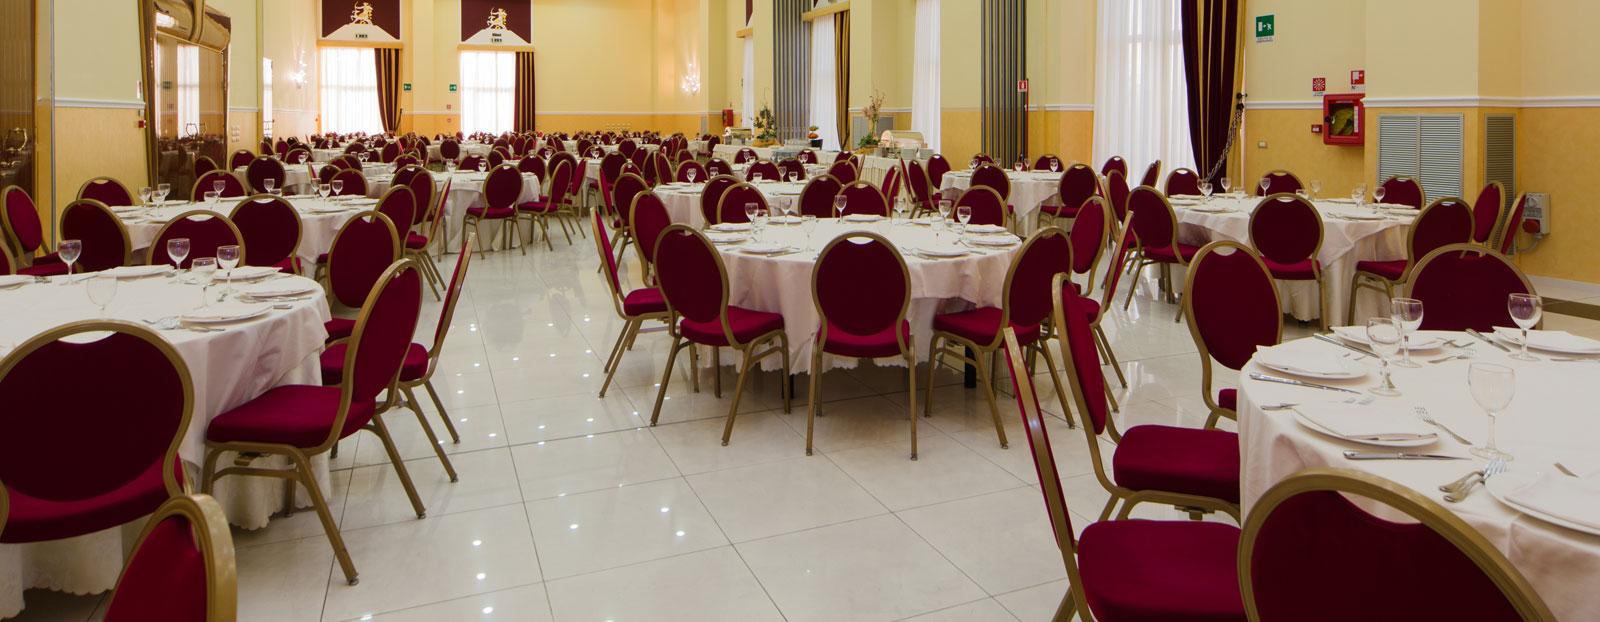 ristorante-bologna-sala-vivaldi-2